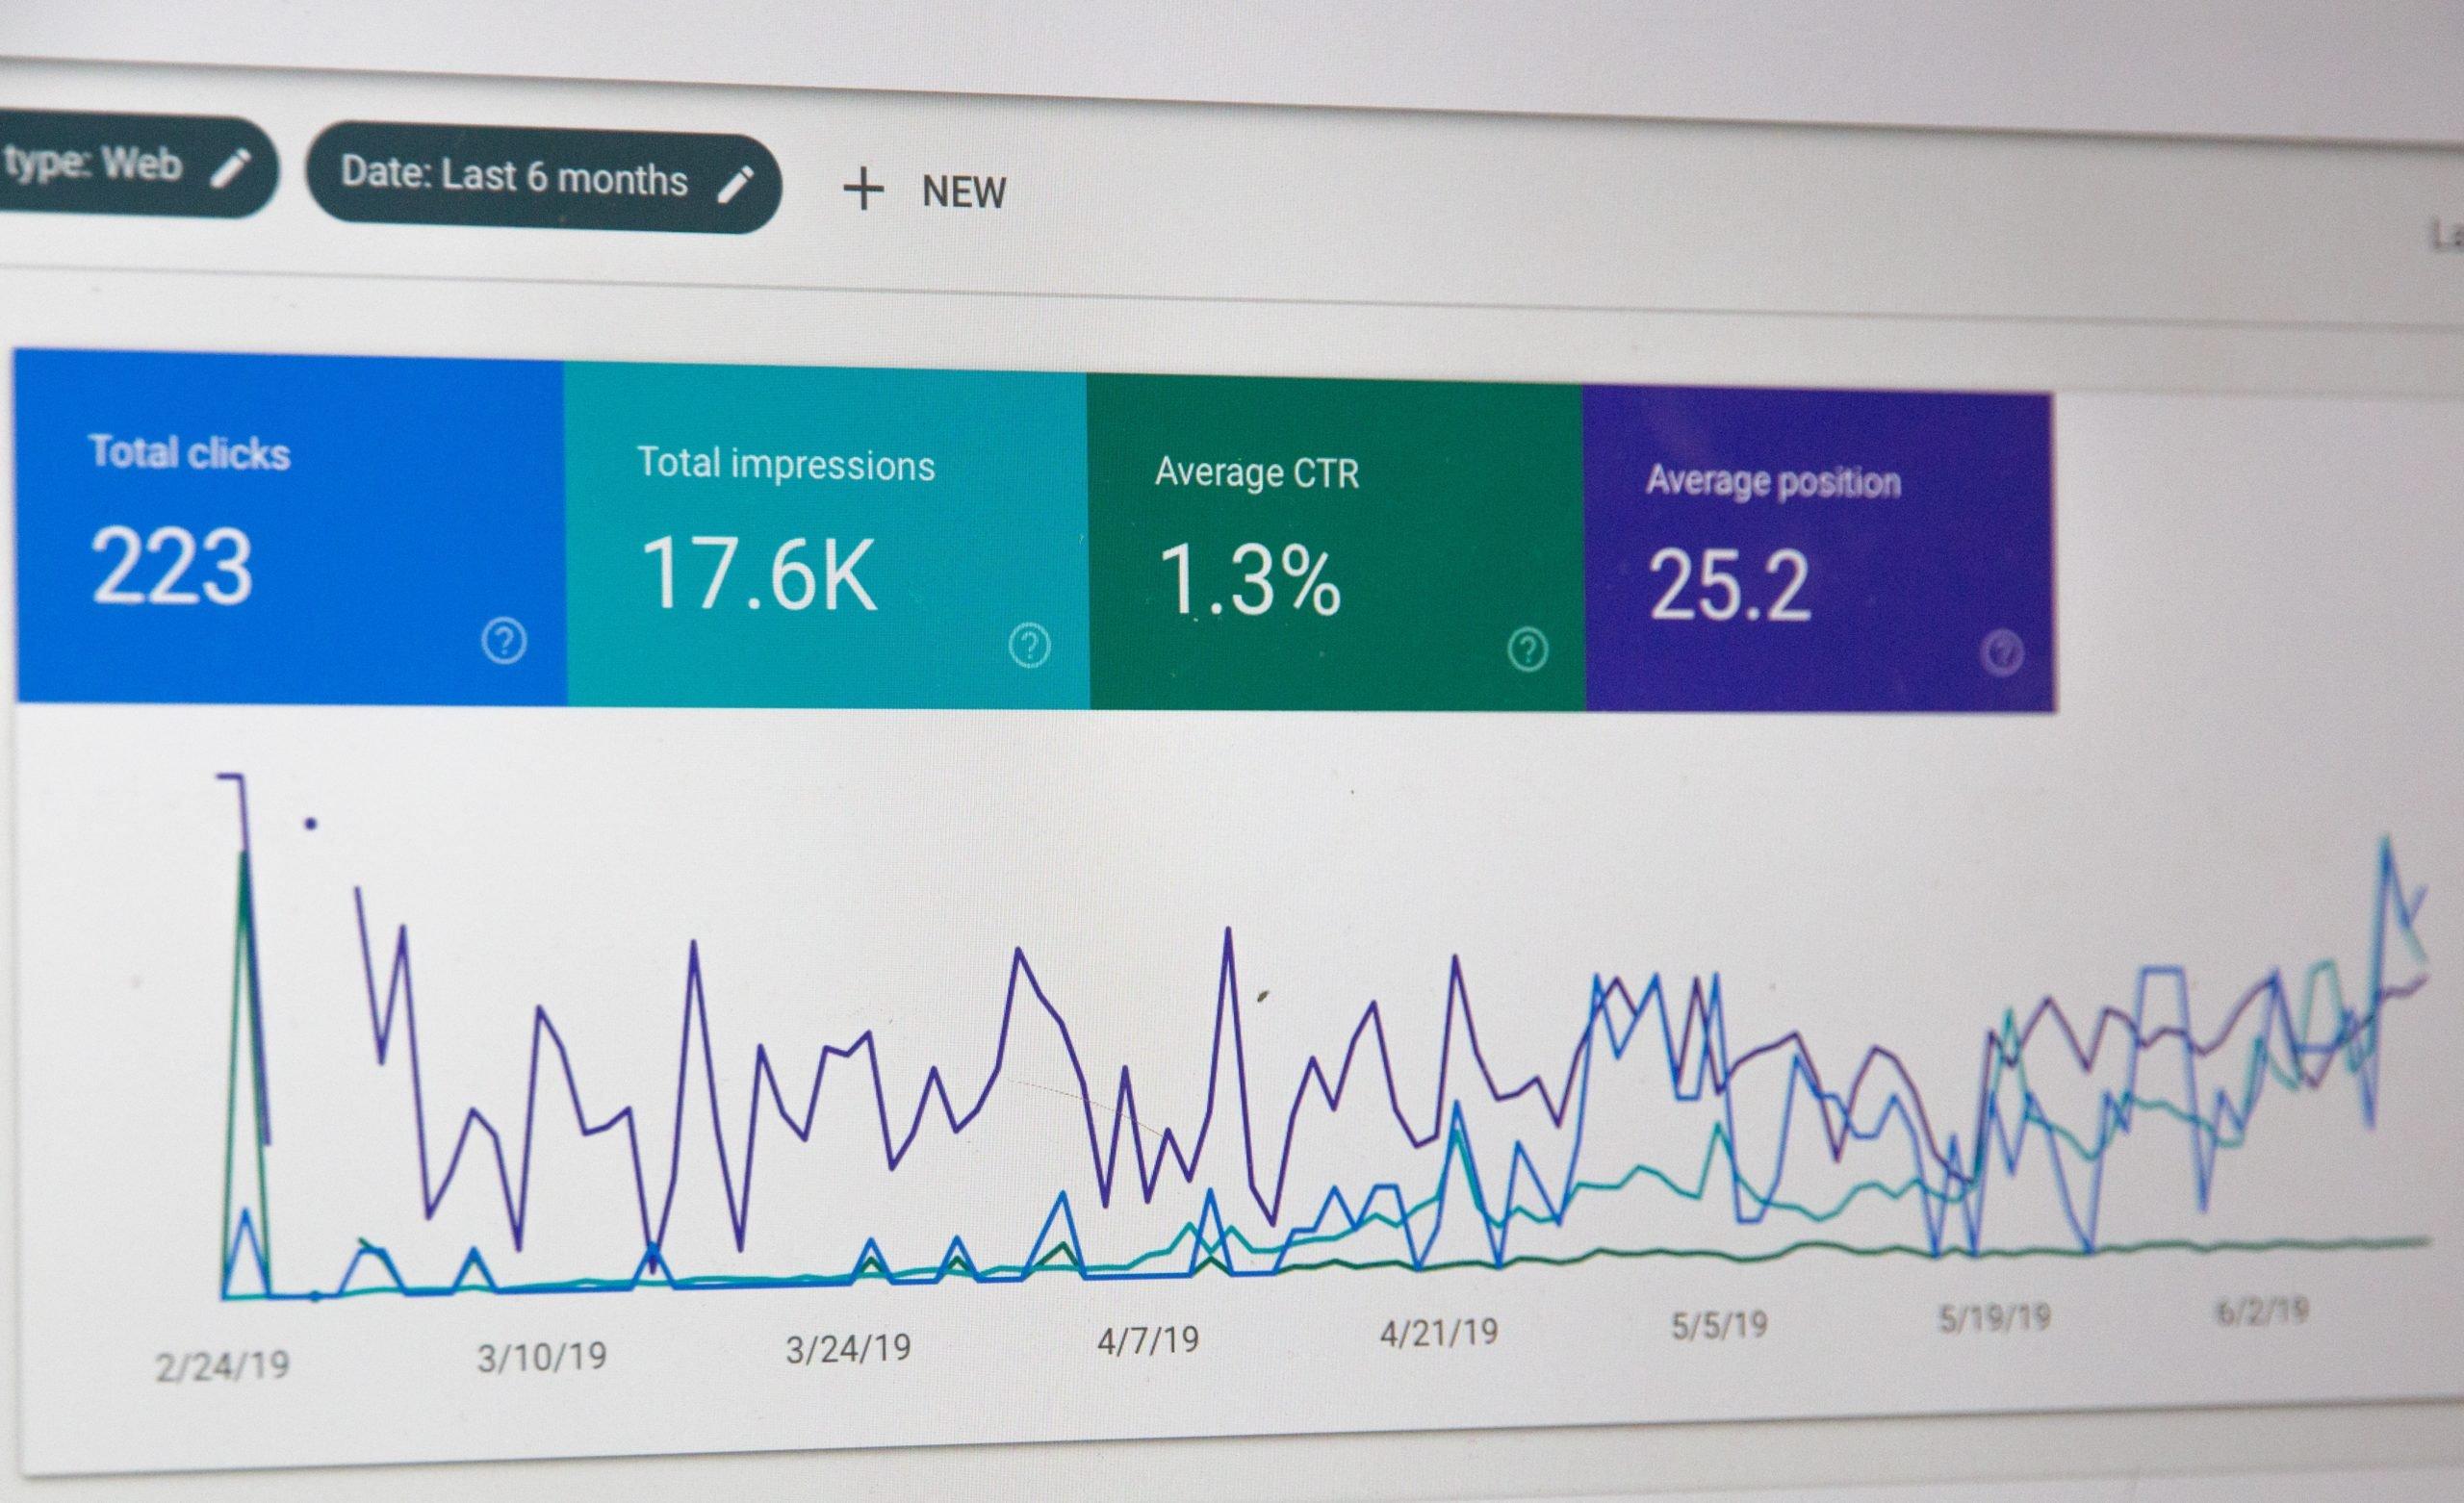 Google Analytics Ecommerce Tracking Through Squarespace